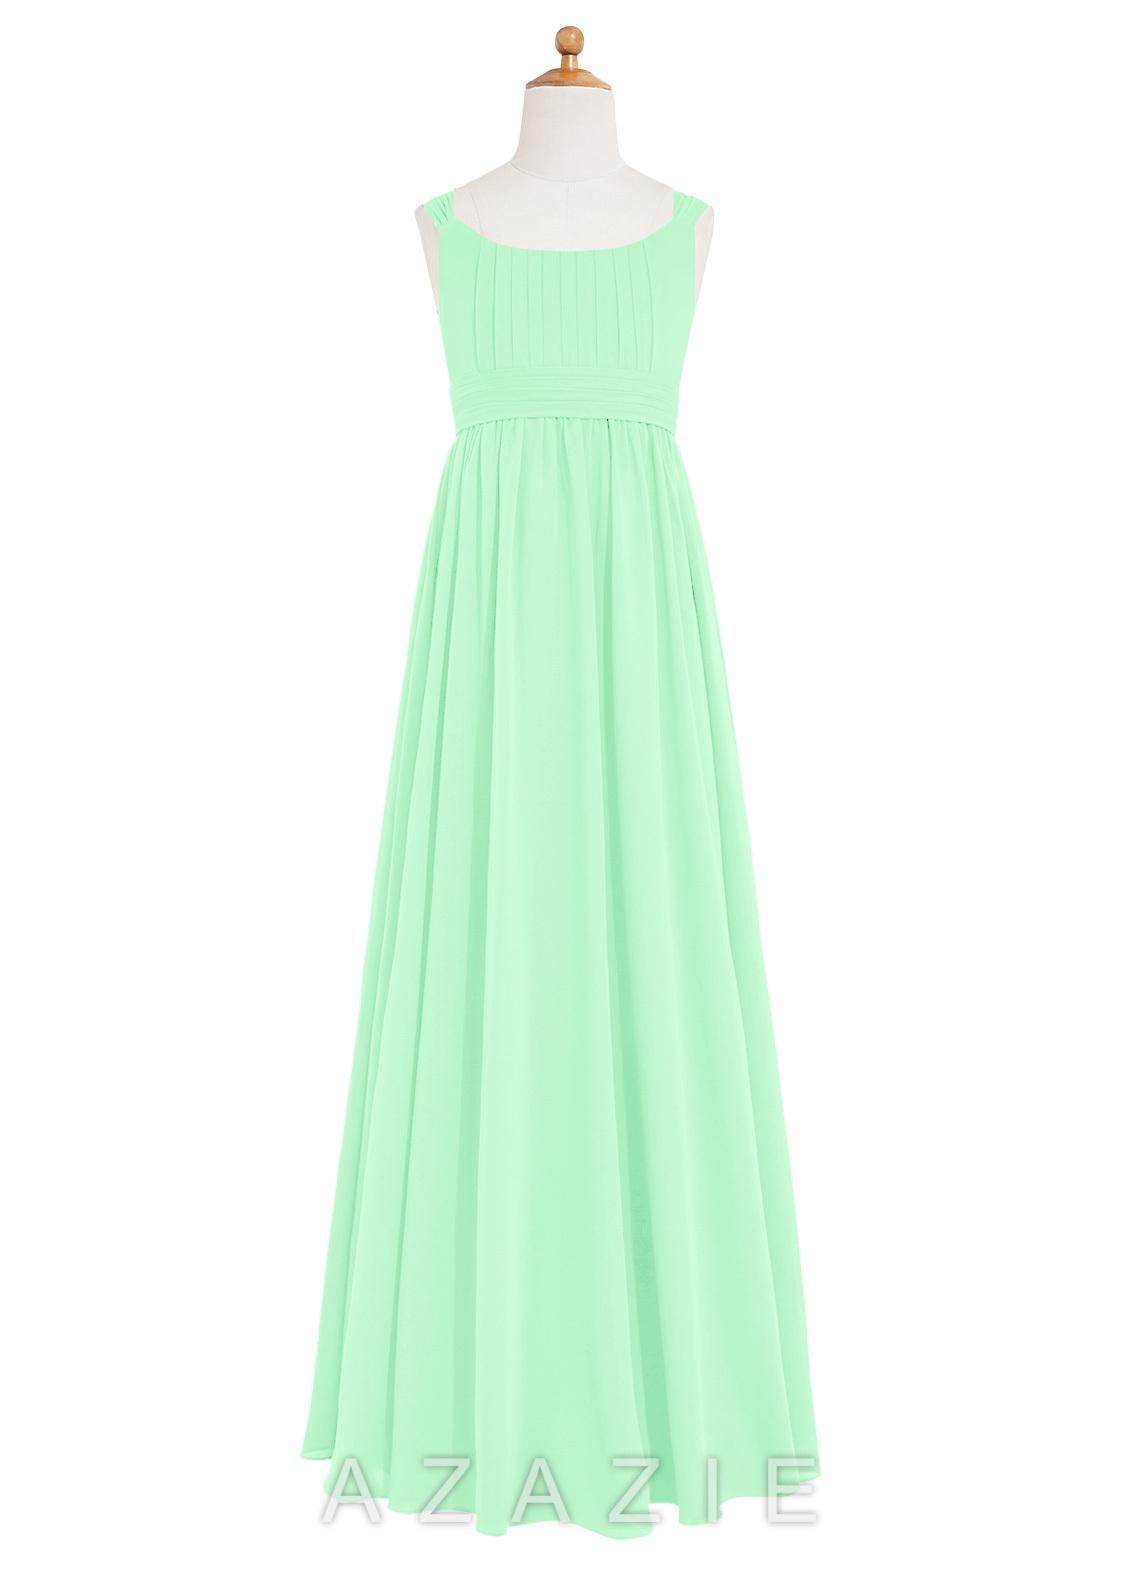 Azazie tiana jbd junior bridesmaid dress azazie color mint green ombrellifo Image collections